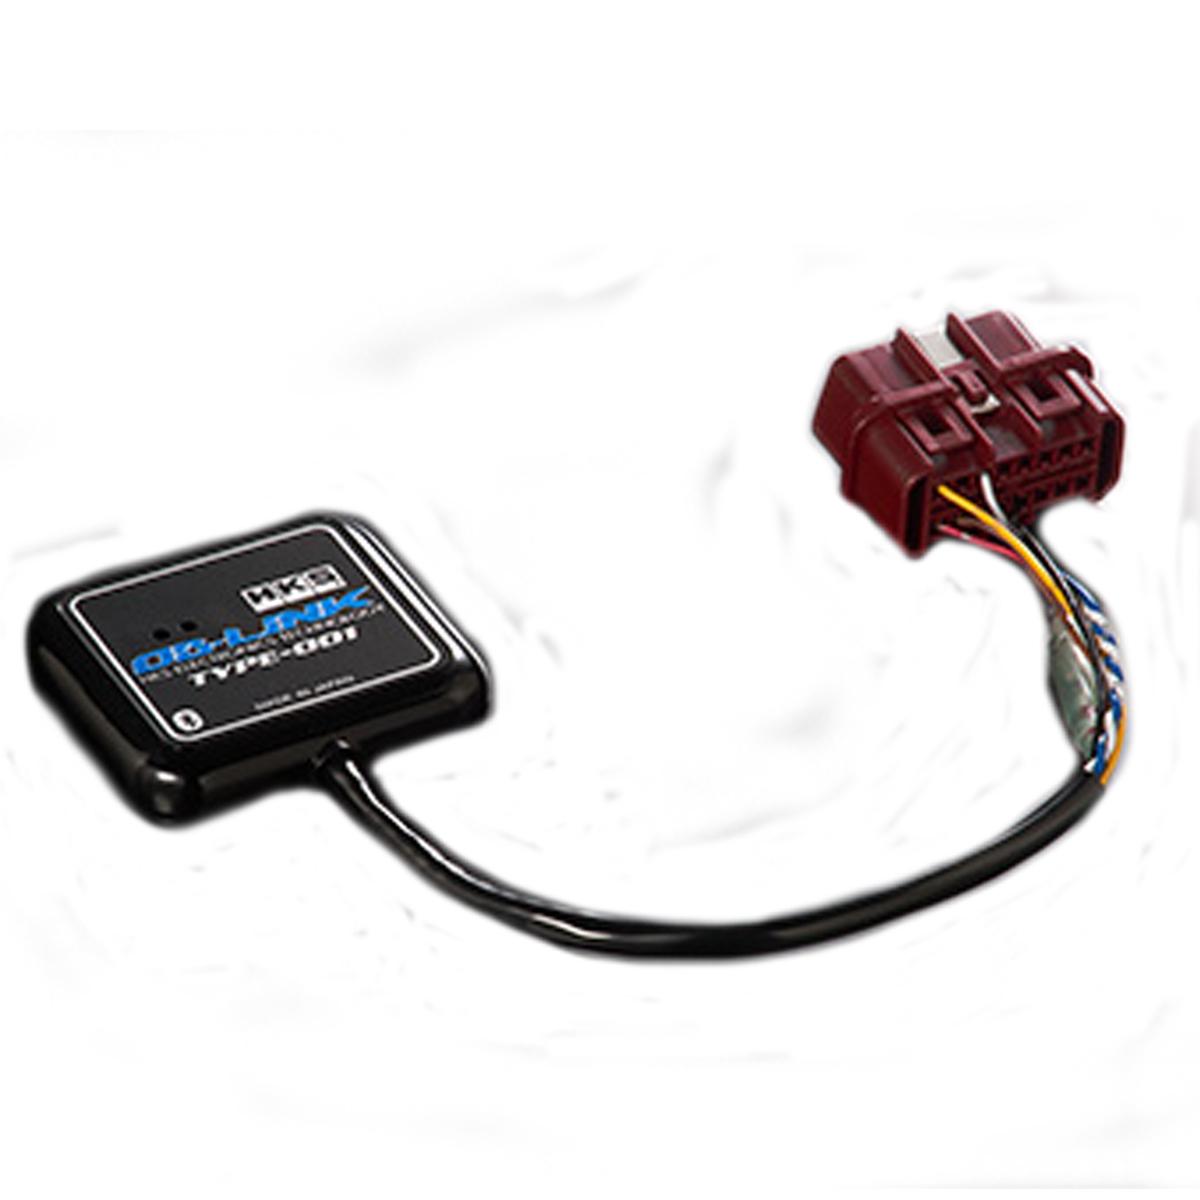 MRワゴン モニター OBリンク タイプ 001 MF22S HKS 44009-AK002 エレクトリニクス